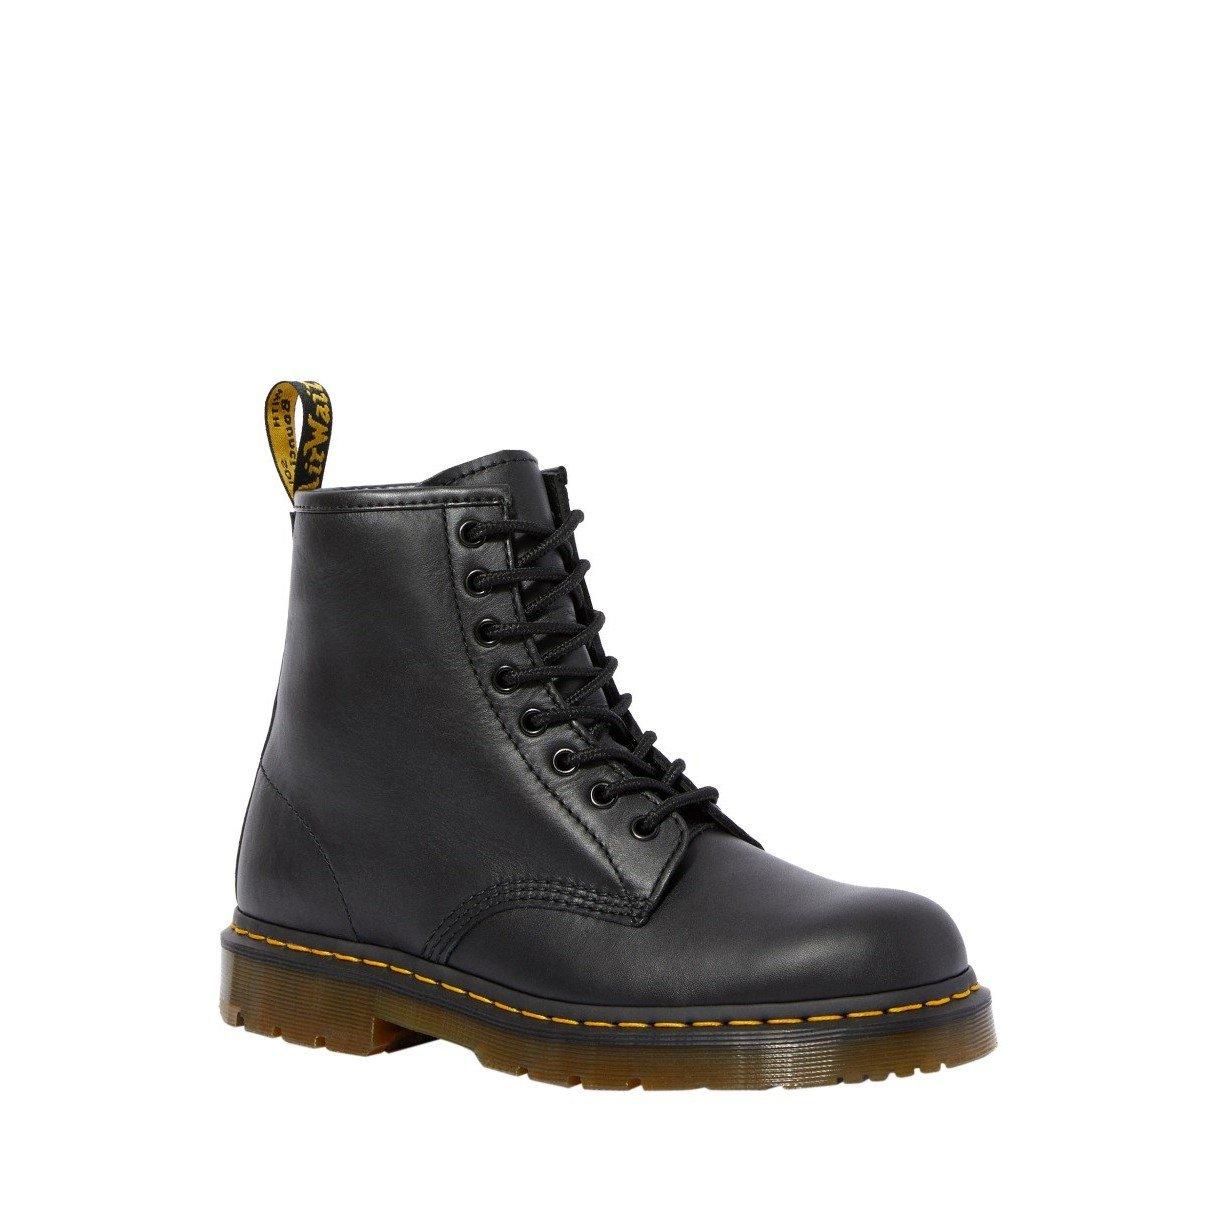 Dr Martens Unisex Slip Resistant Leather Ankle Boots Black 34021 - Black 3